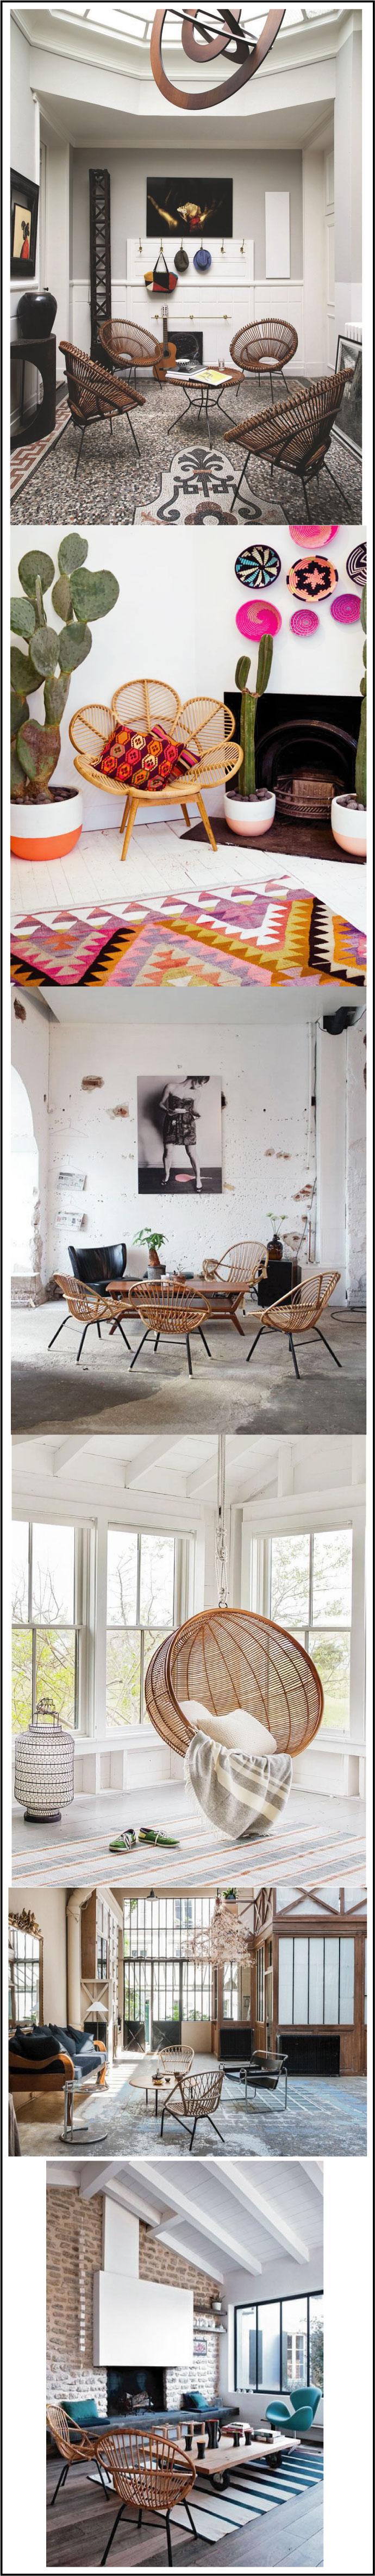 tendance-rotin -osier-fauteuils-en-rotin-chiara-stella-home